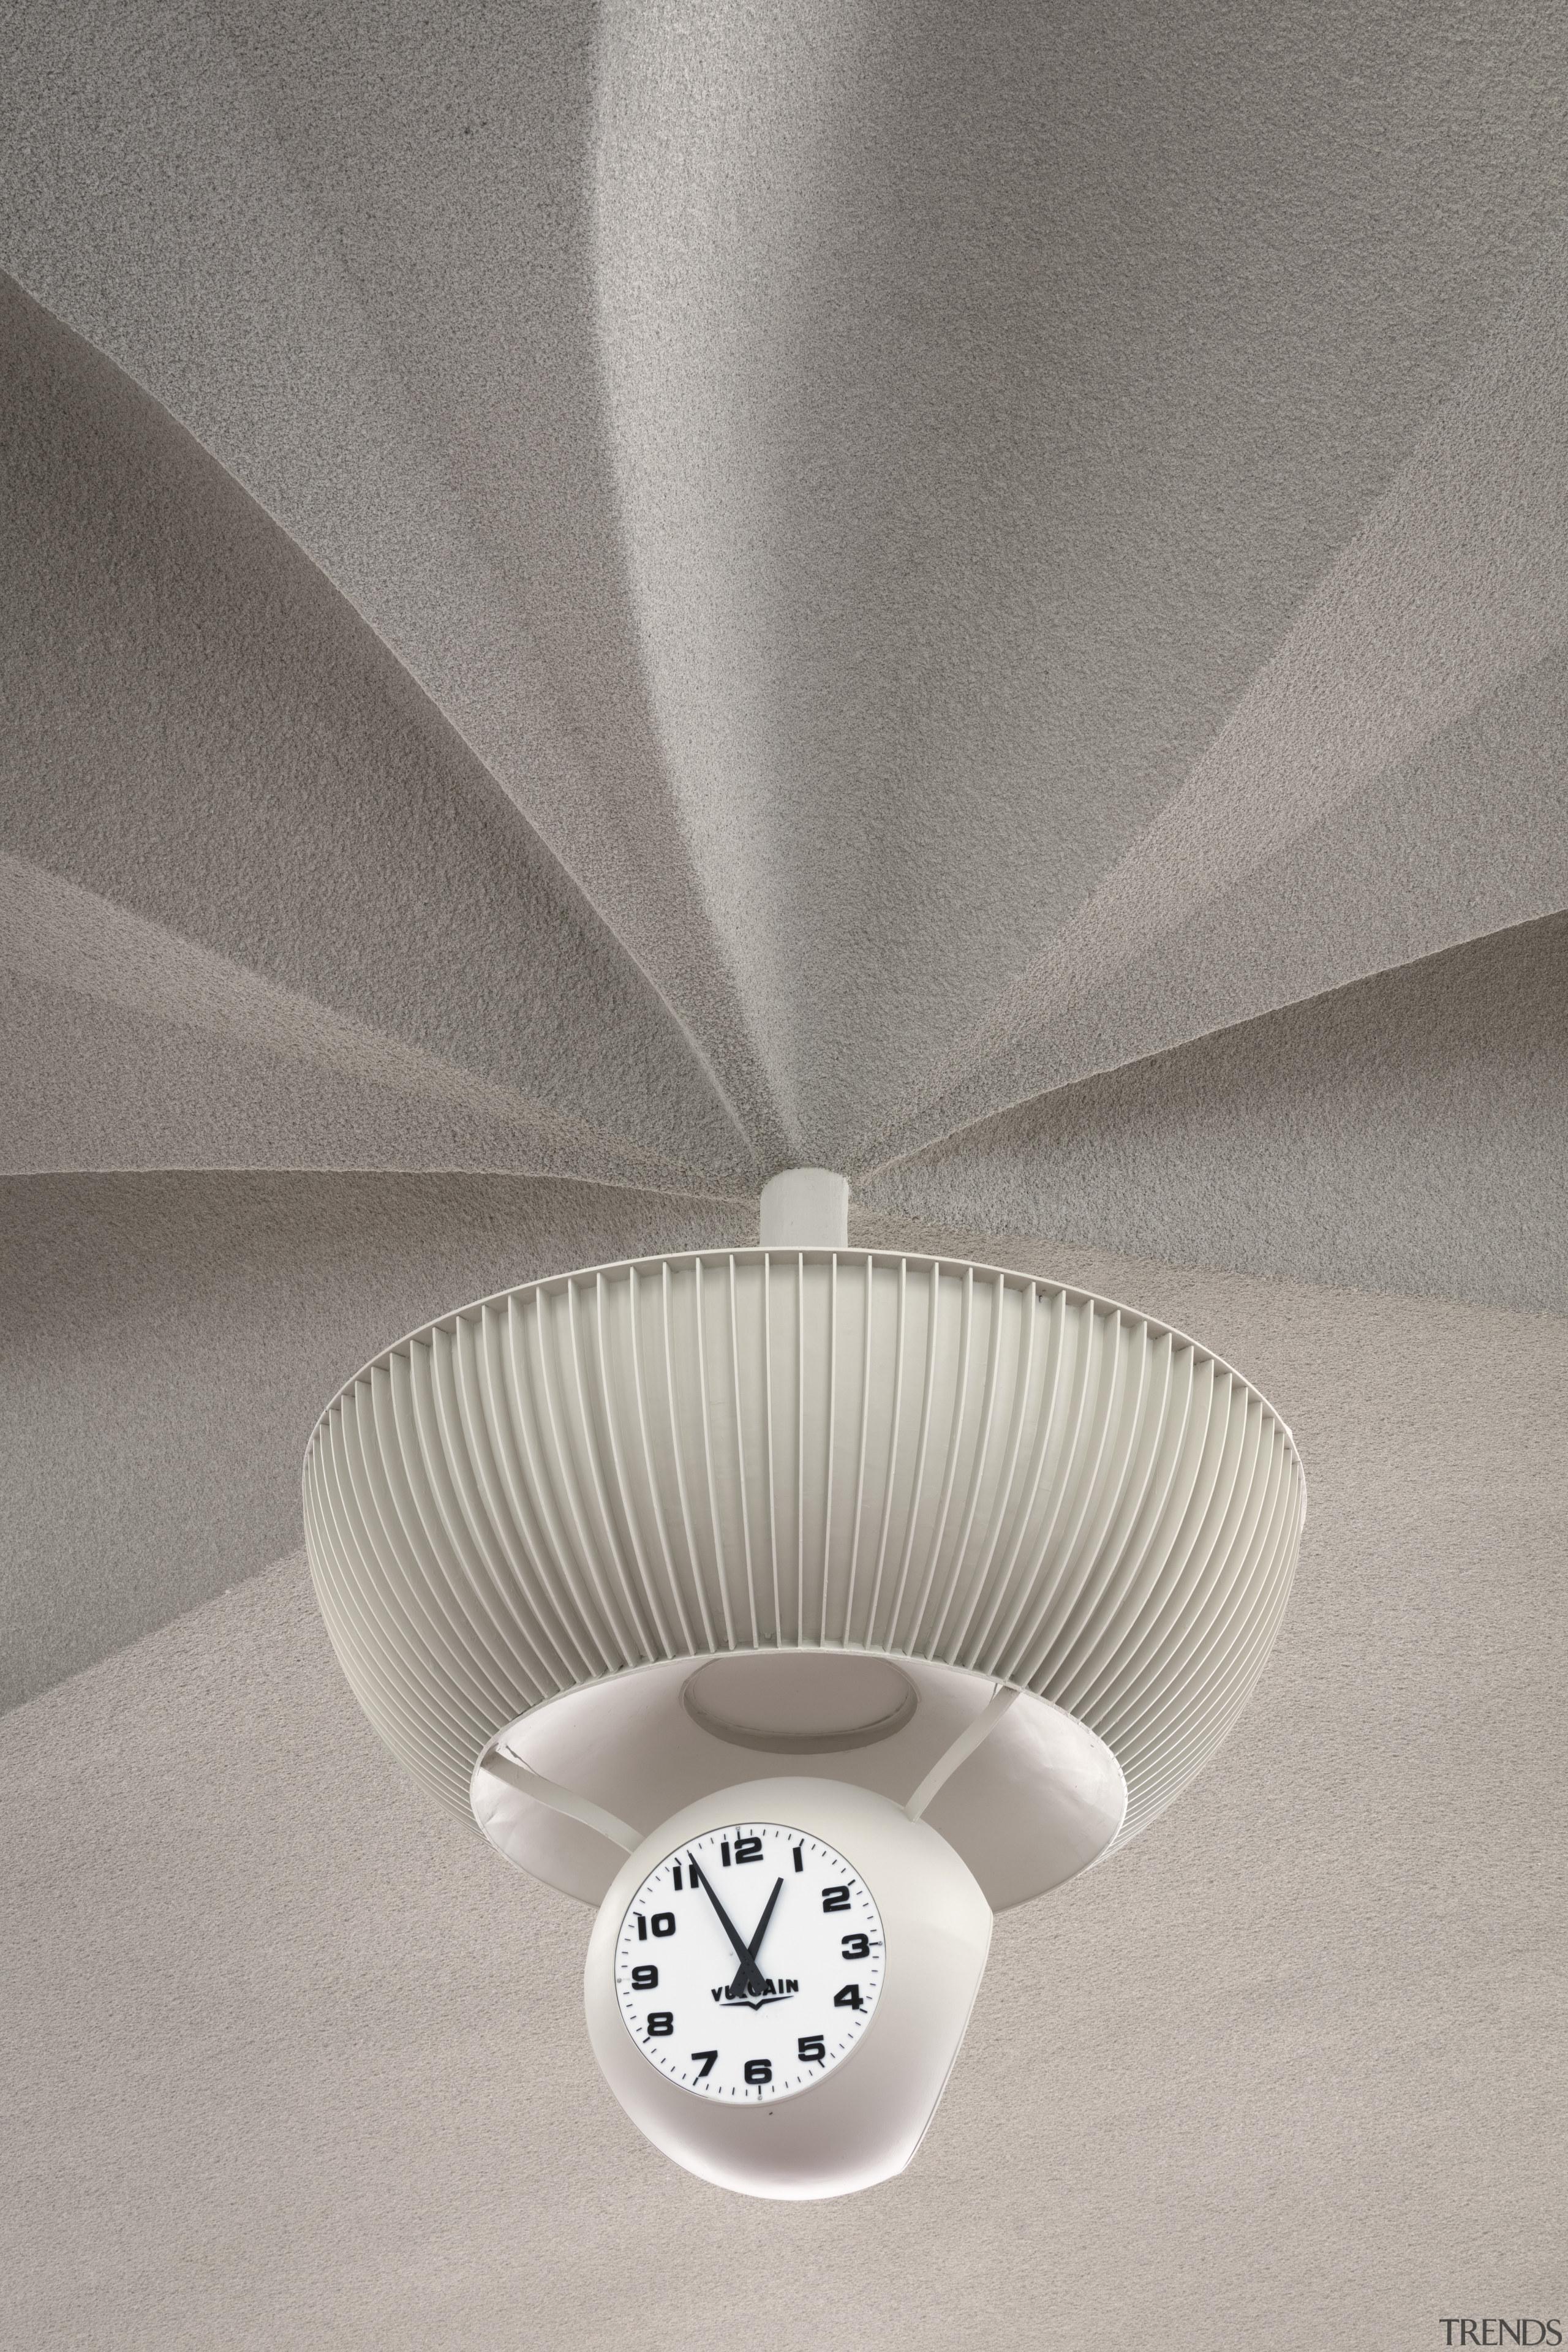 The original Flight Center's signature Vulcain clock ticks architecture, Vulcain Clock, TWA Hotel, Lobby